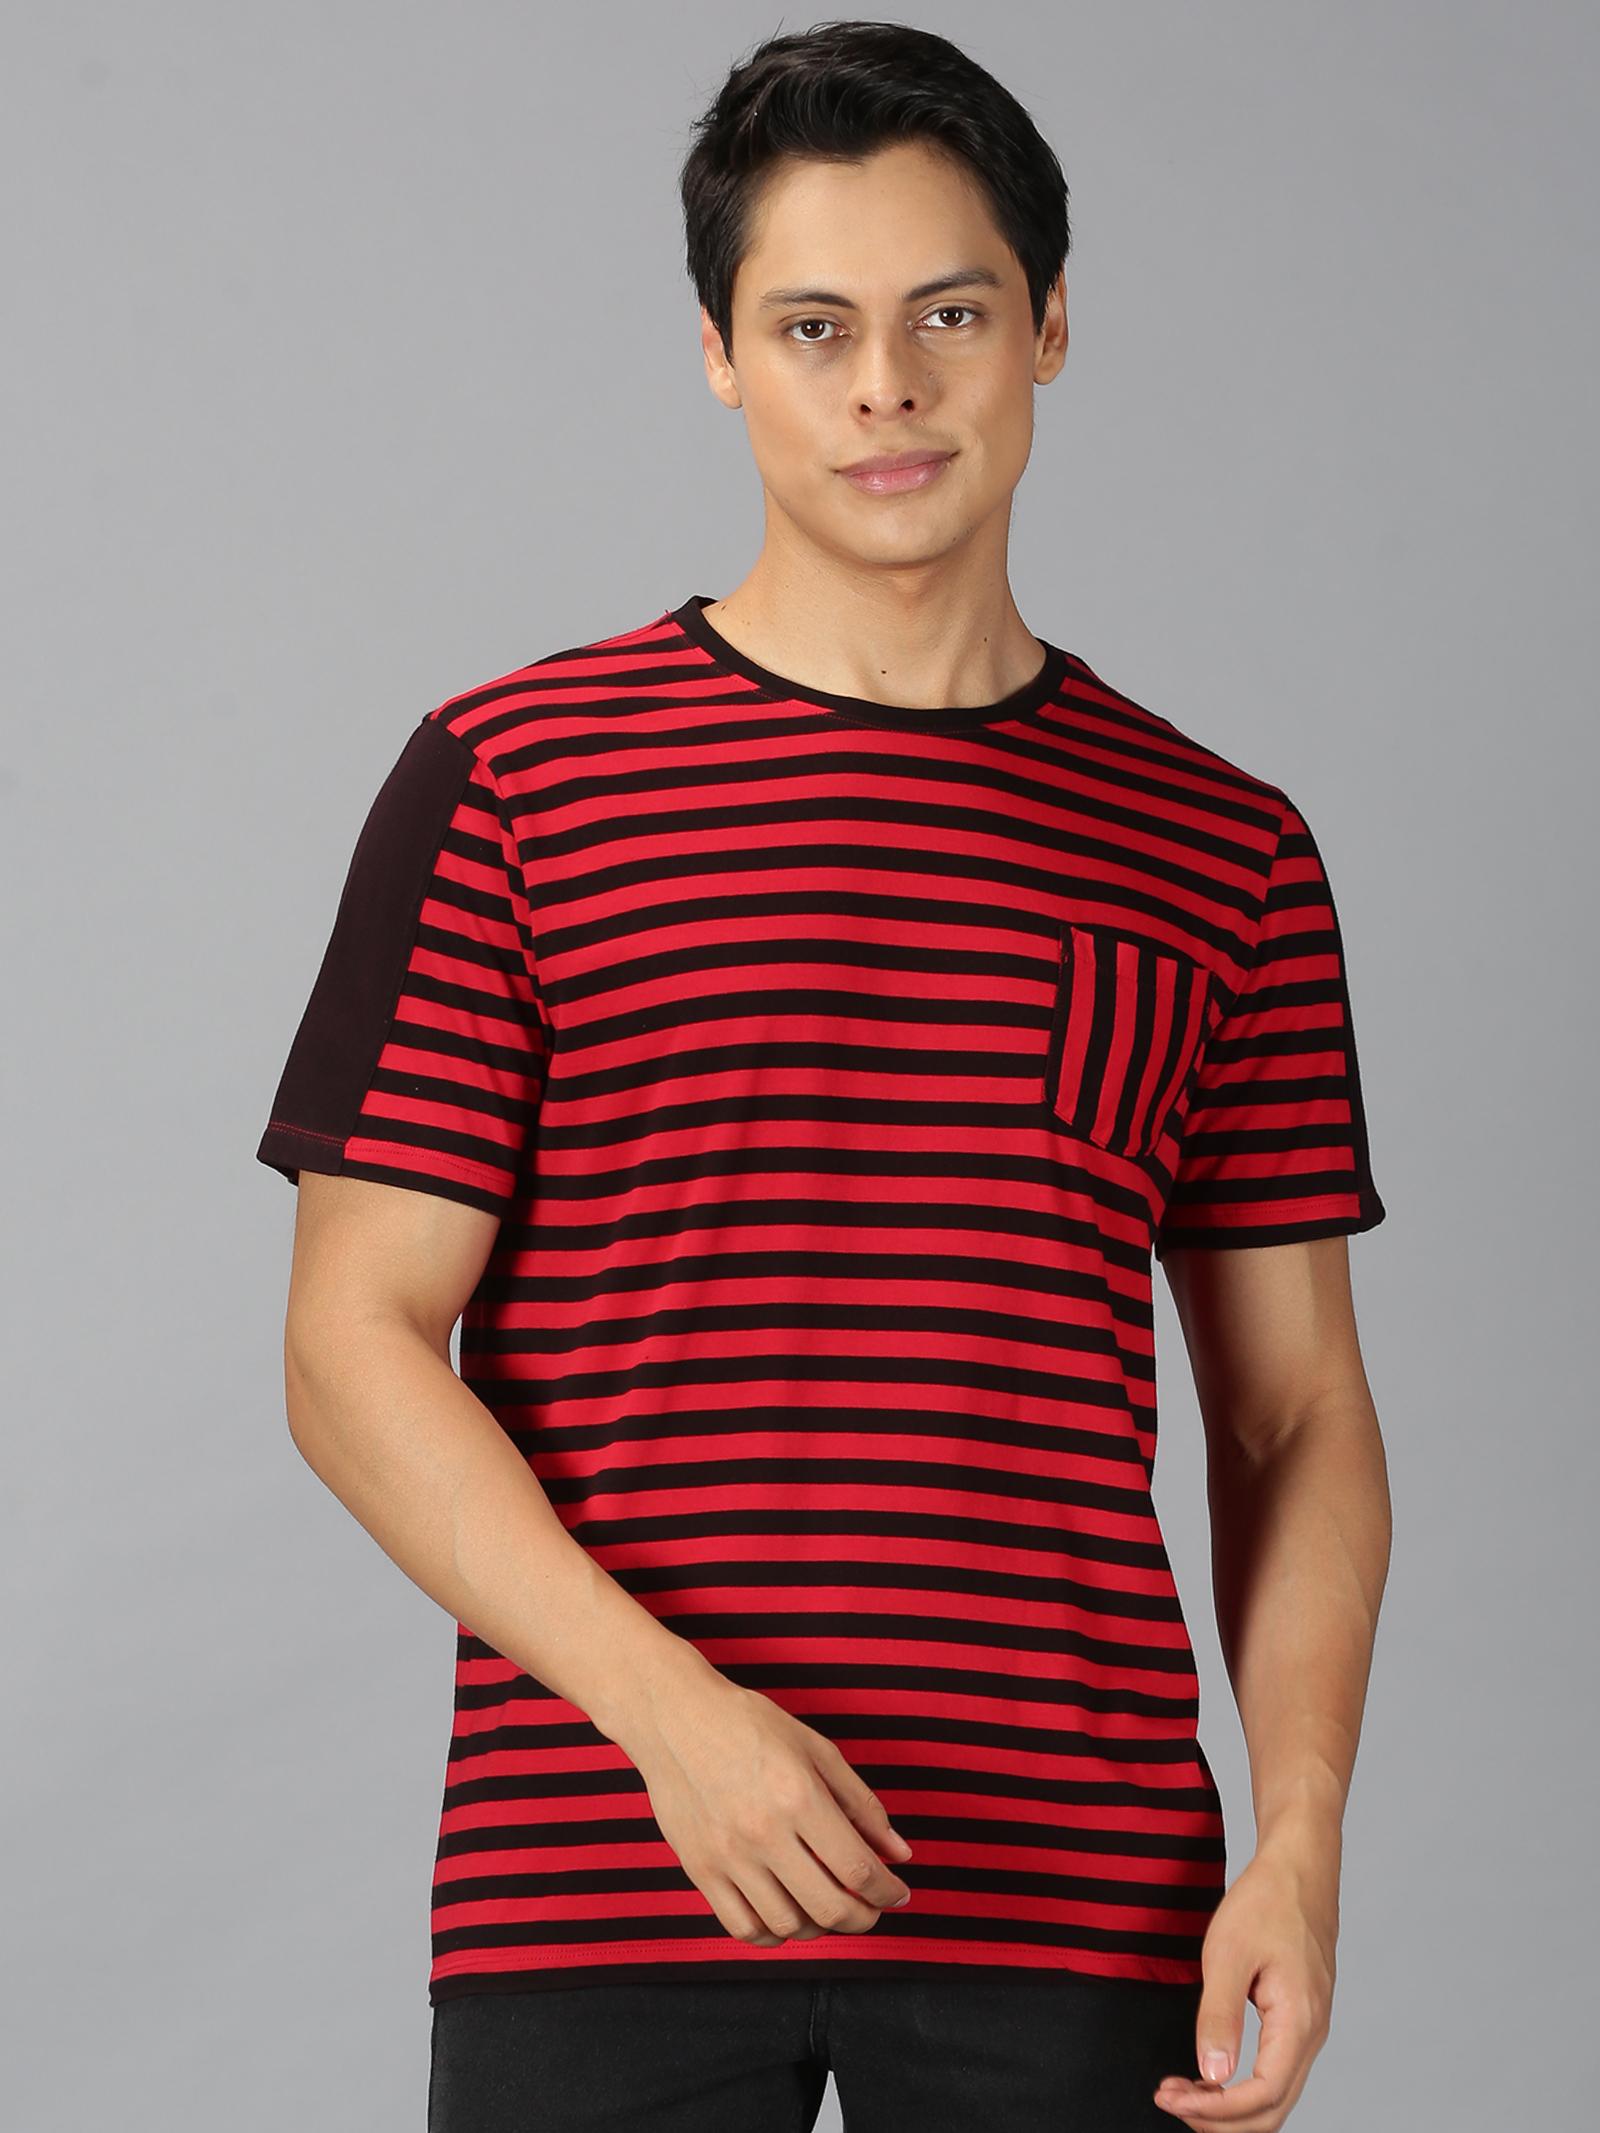 UrGear | UrGear Stripes Men Round Neck Red,Black T-Shirt